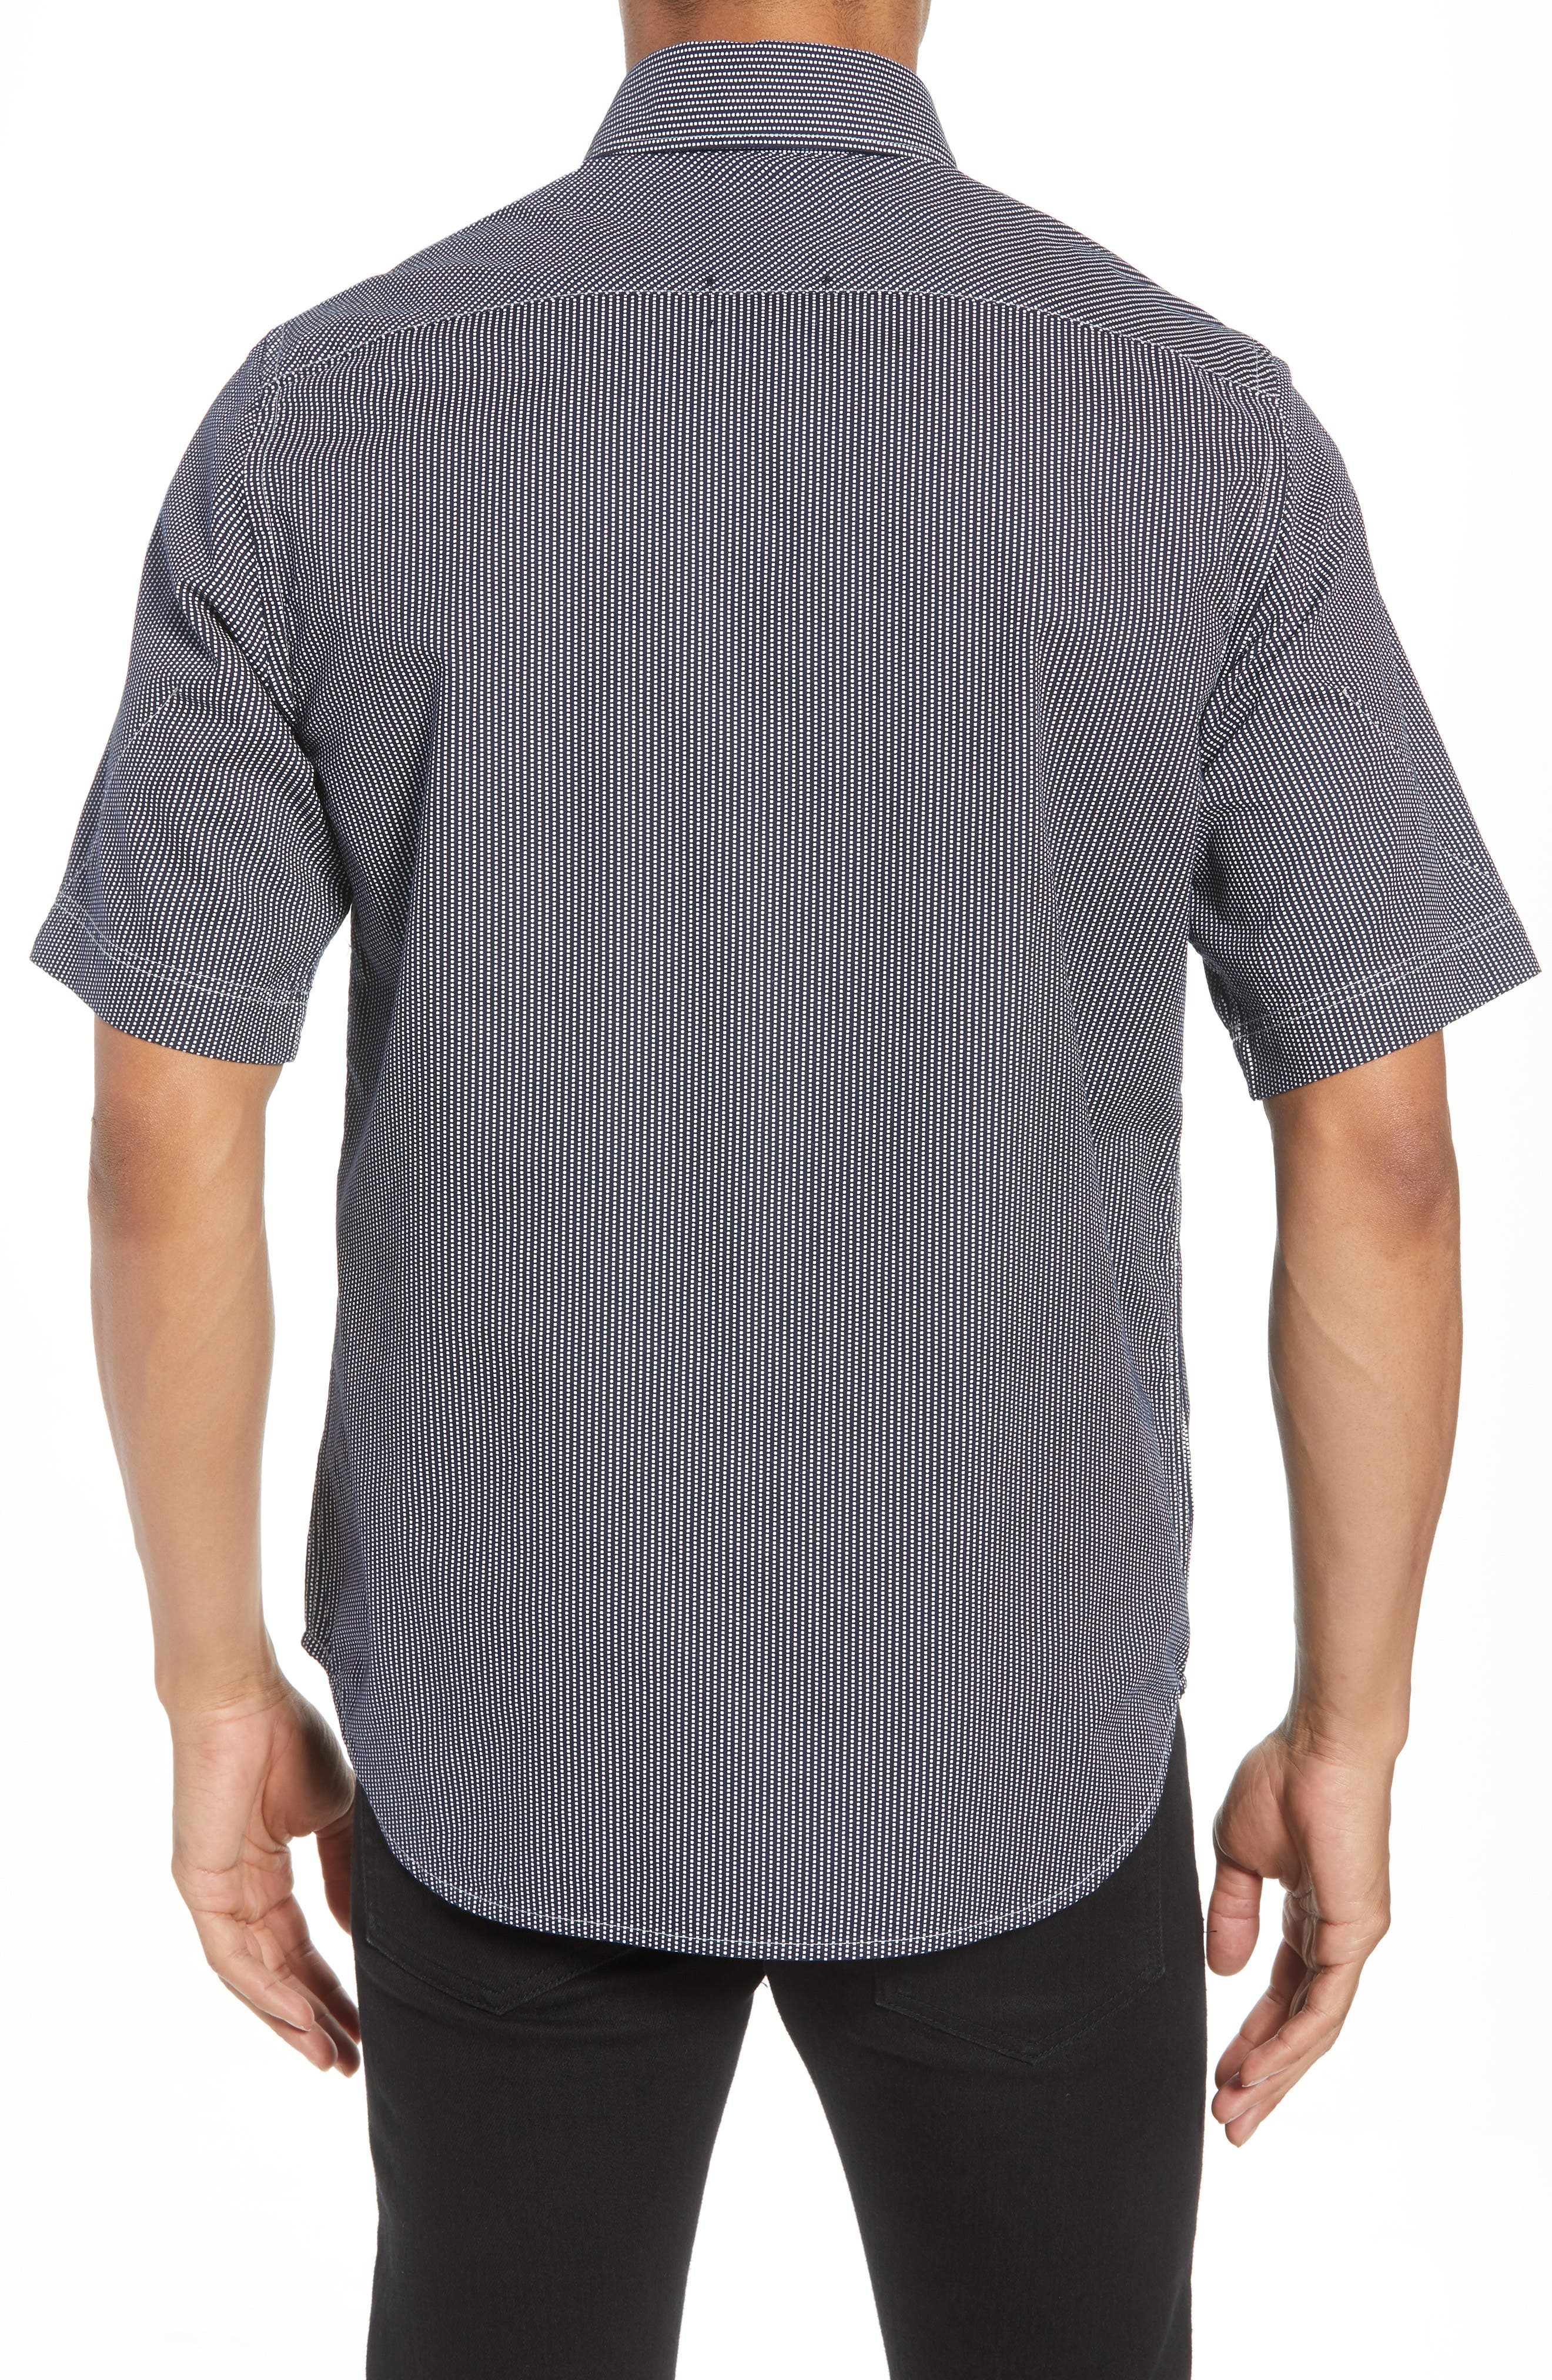 Bristum Straight Ref Shirt,                             Alternate thumbnail 2, color,                             400